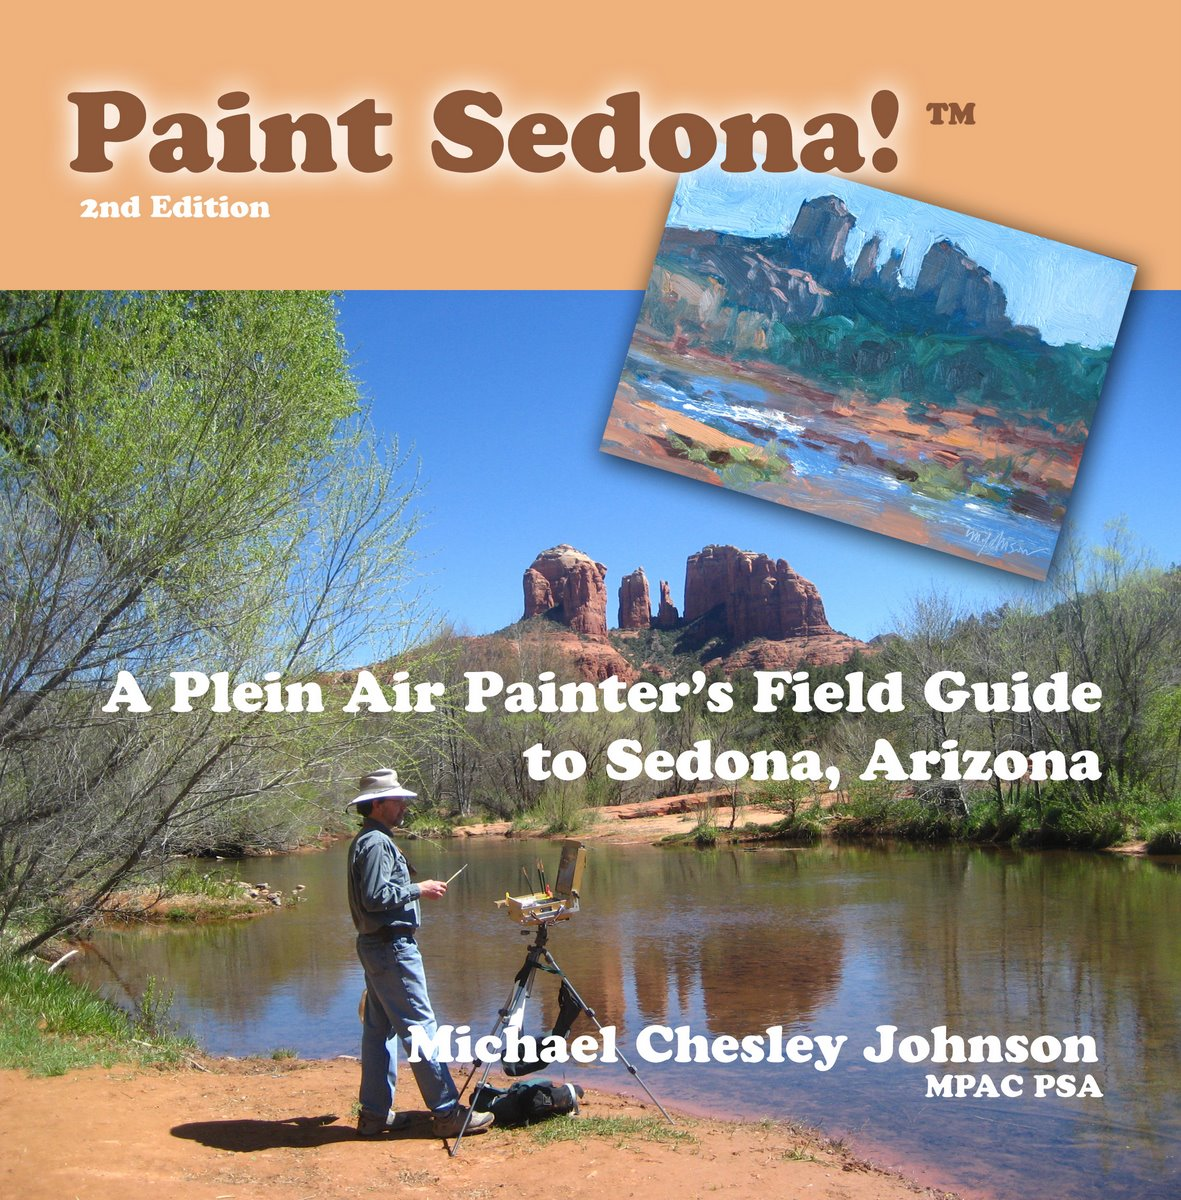 Paint Sedona: A Plein Air Painter's Field Guide to Sedona, Arizona Michael Chesley Johnson